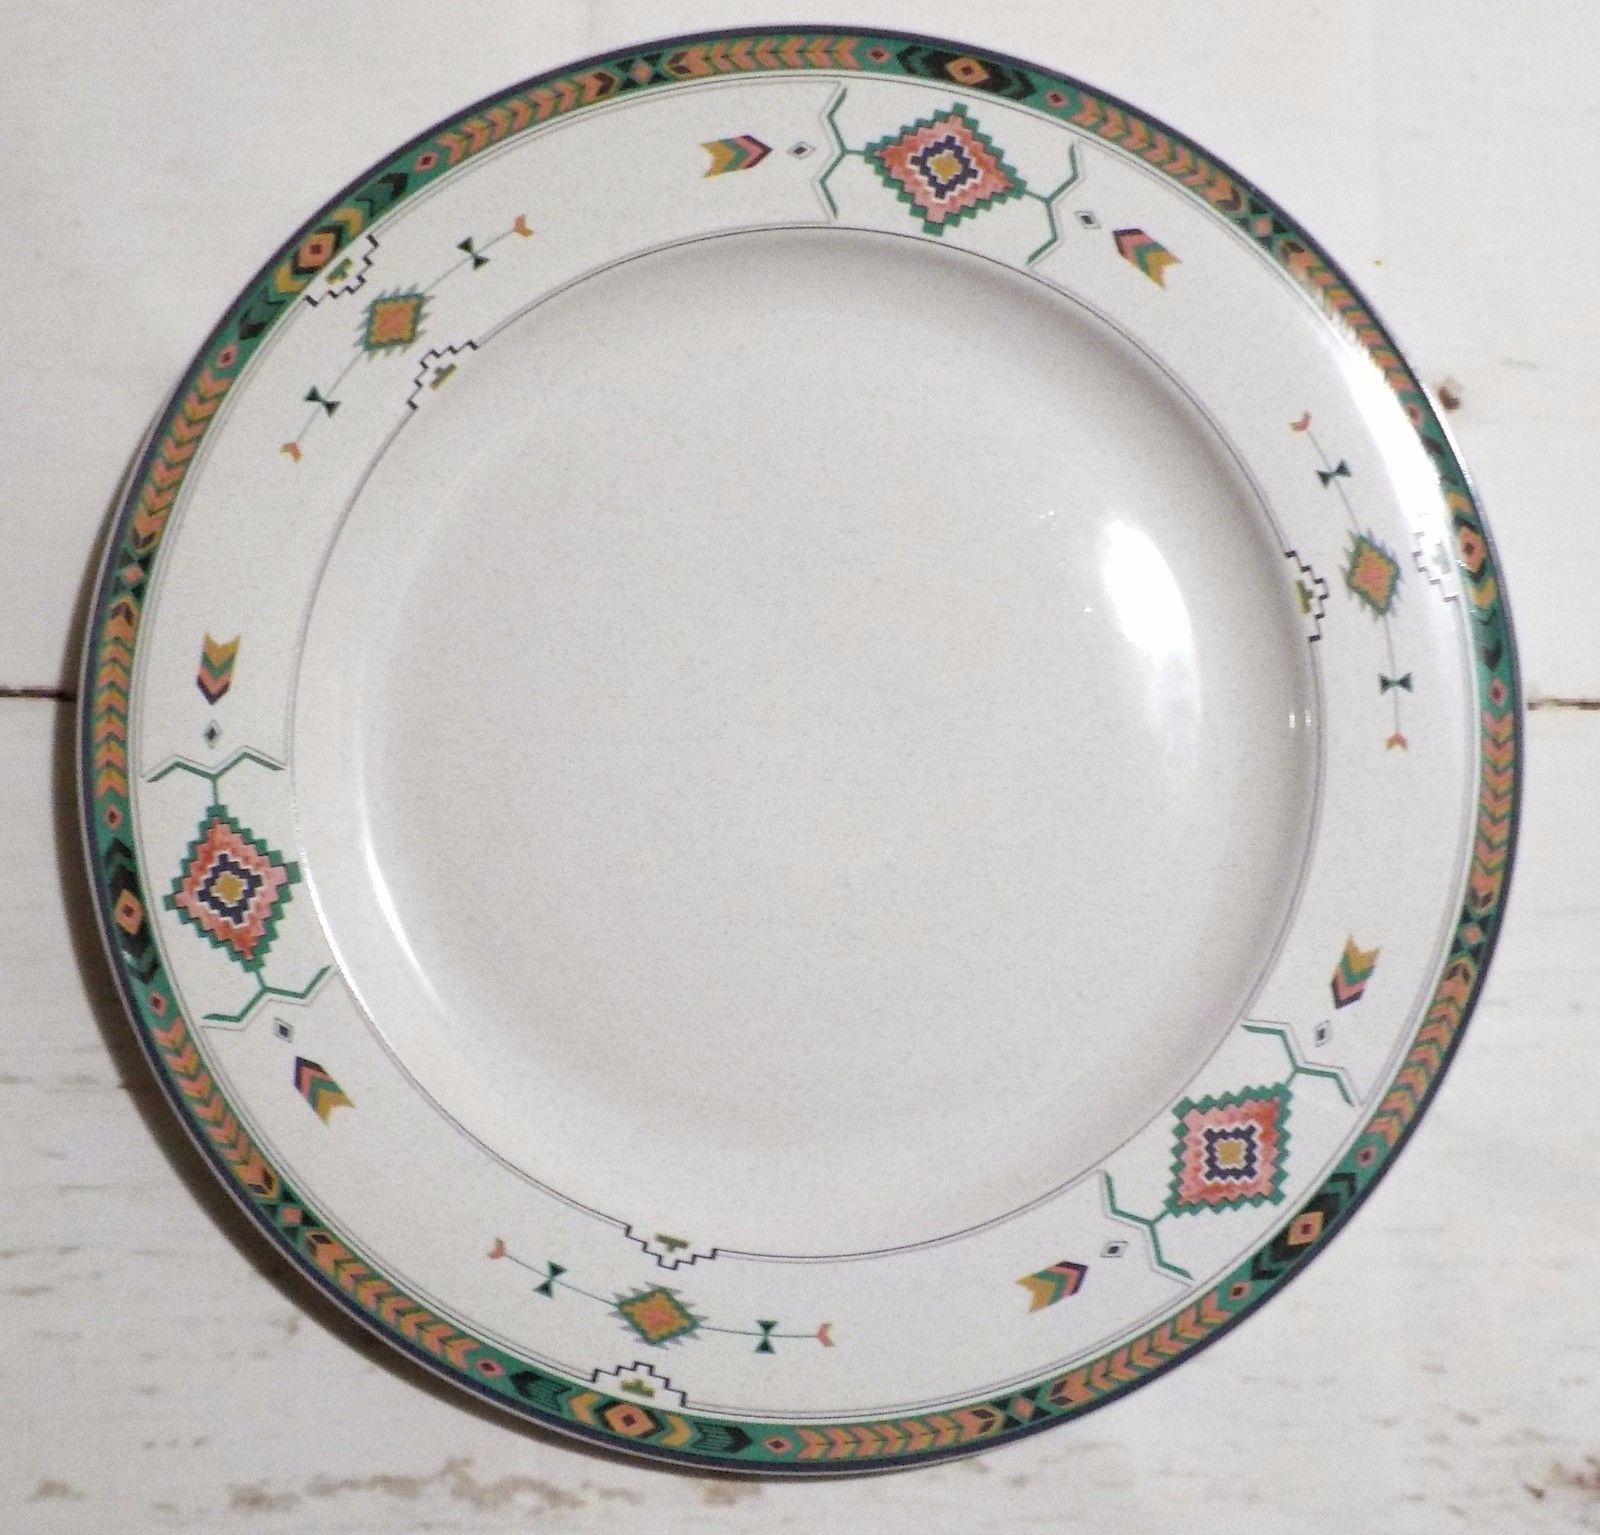 Studio Nova Adirondack Southwestern Round Platter Chop Plate 12  oven to table - $19.79 & Studio Nova Dinner Plates: 15 listings